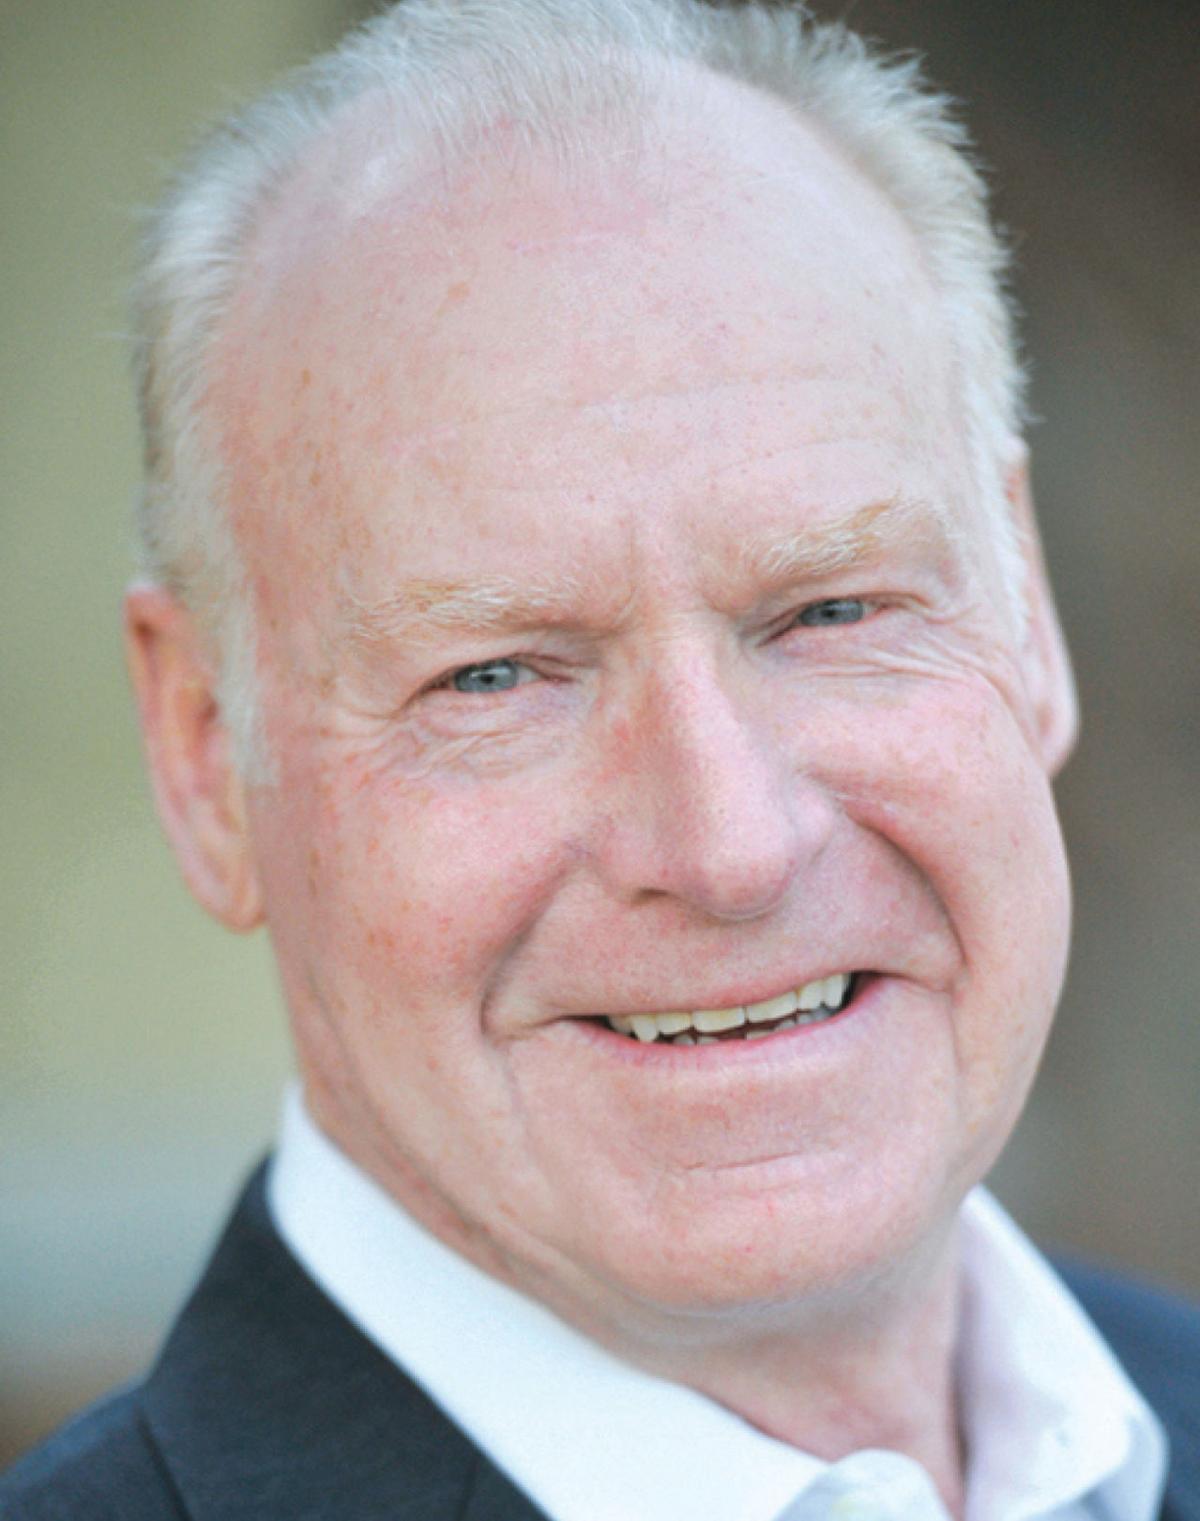 Mayor Peter Hendricks